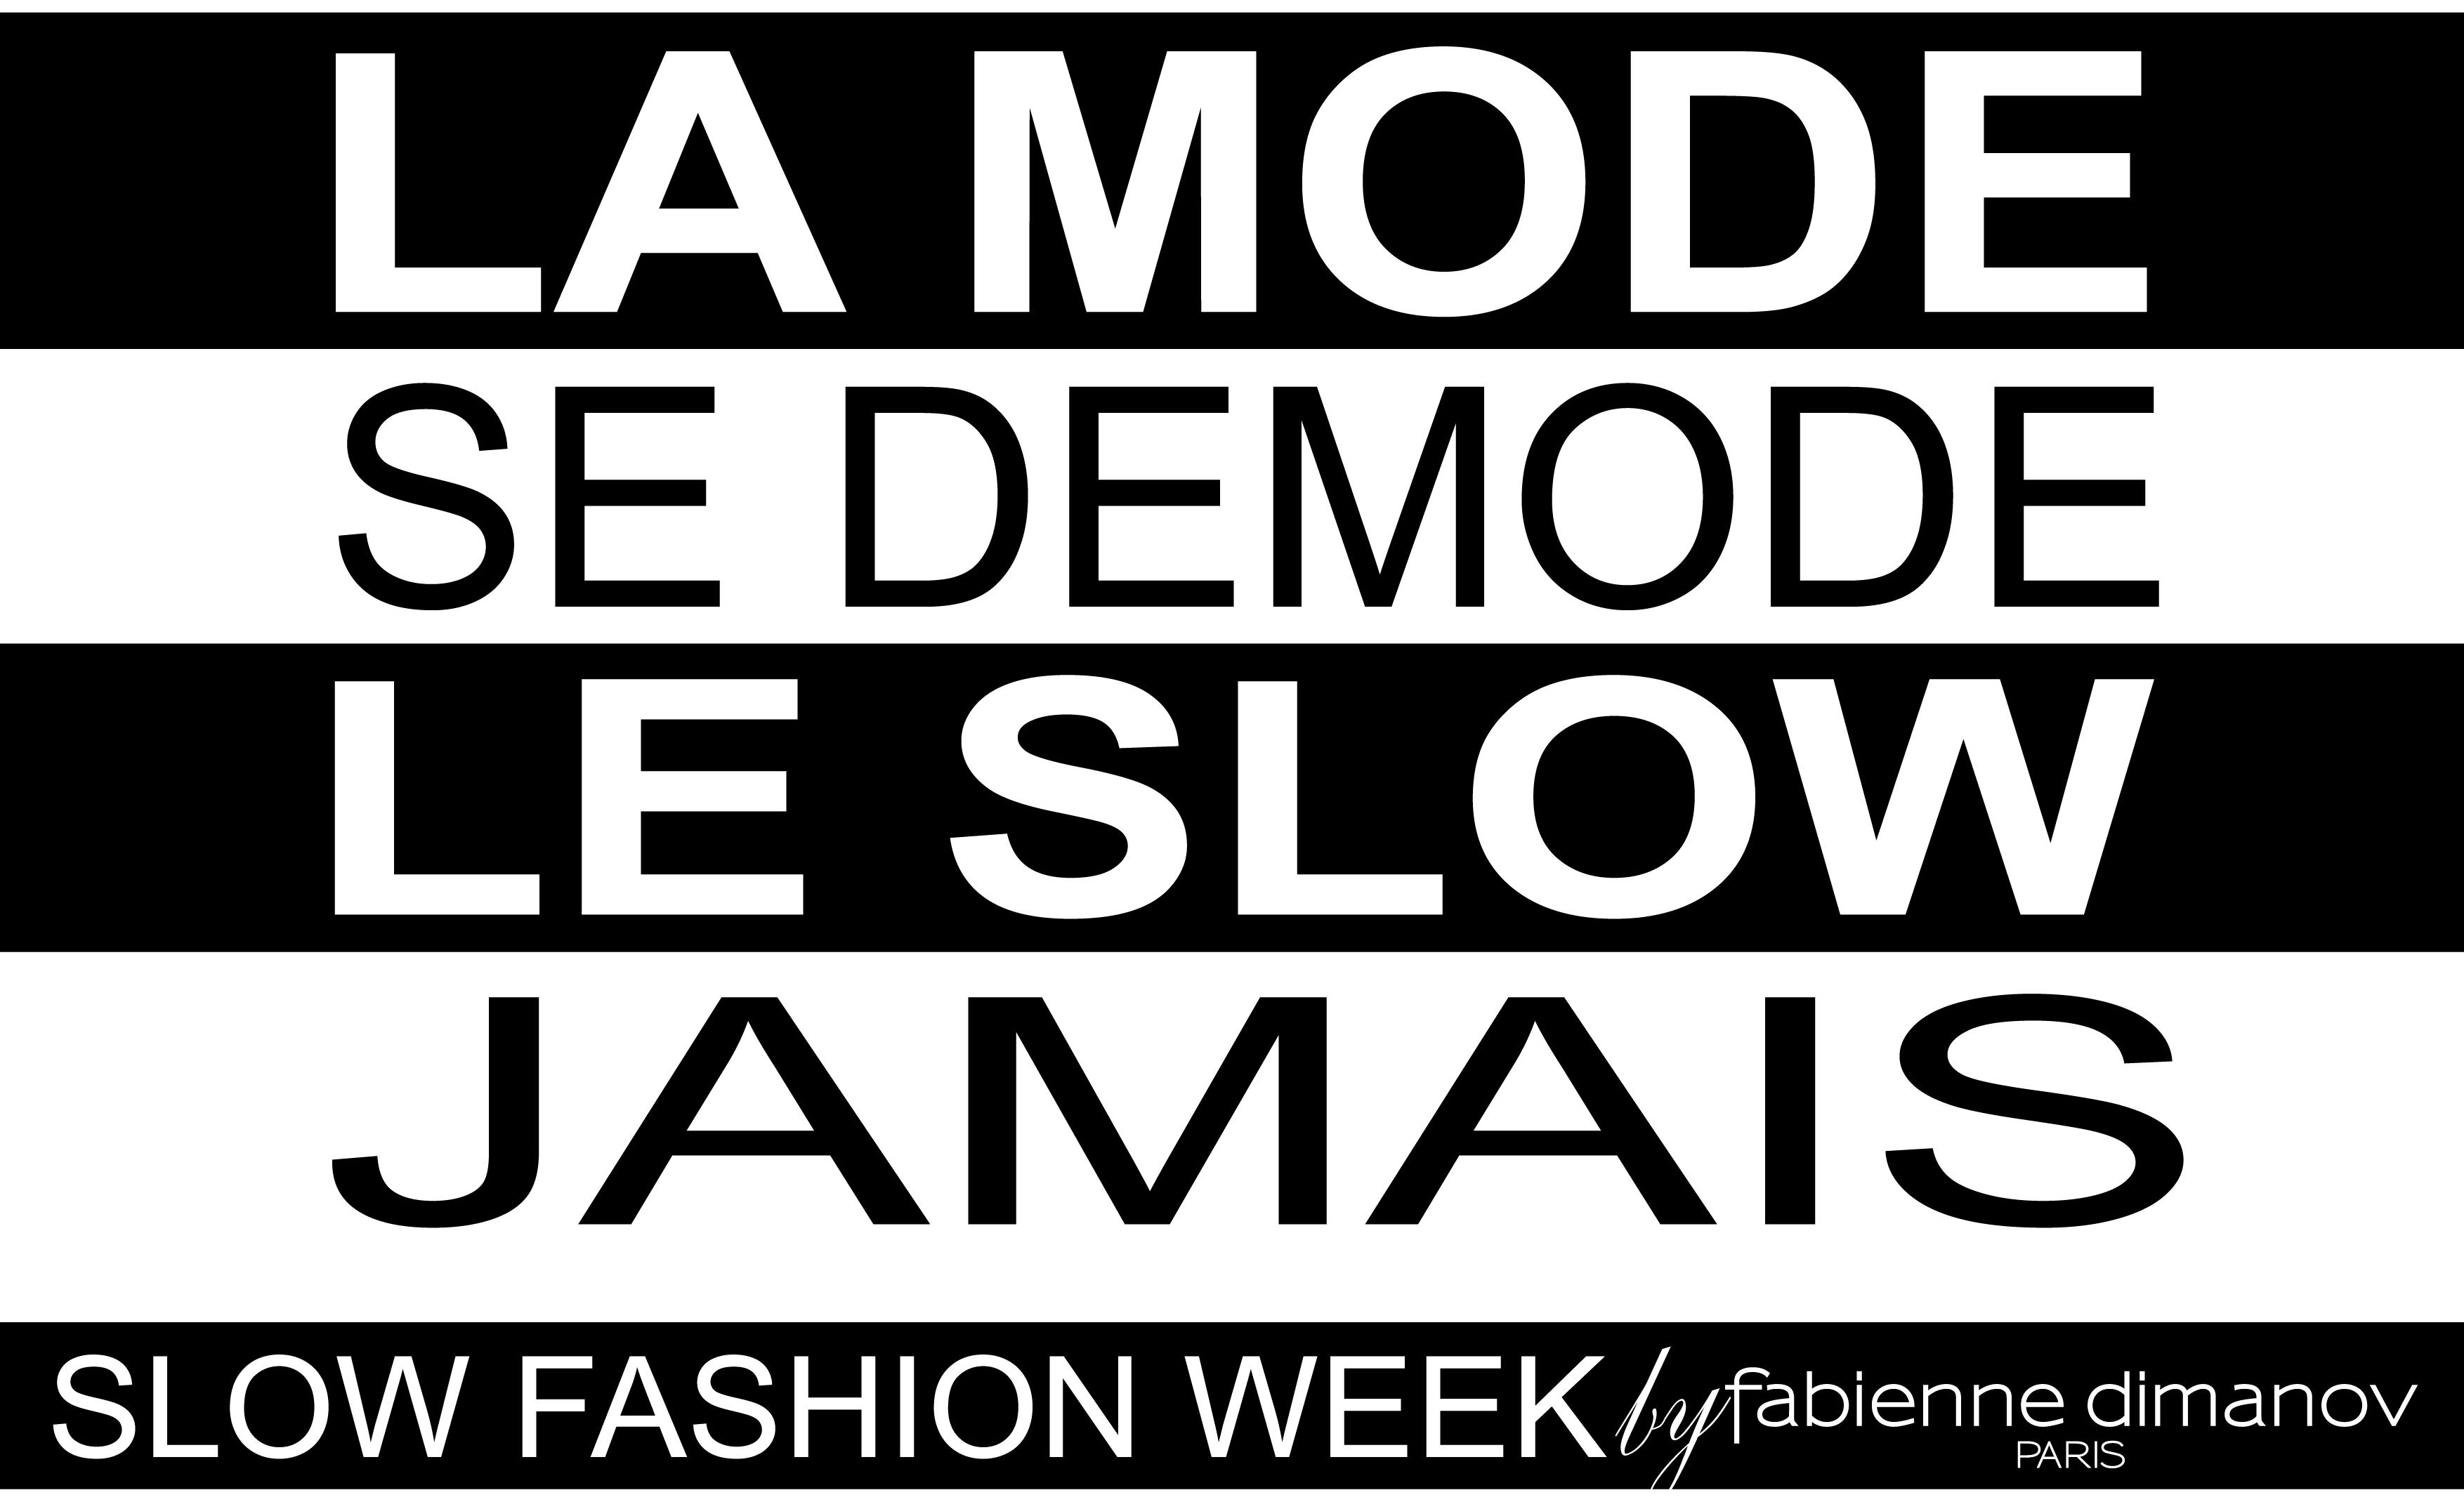 Slow Fashion Week- Fabienne Dimanov Paris